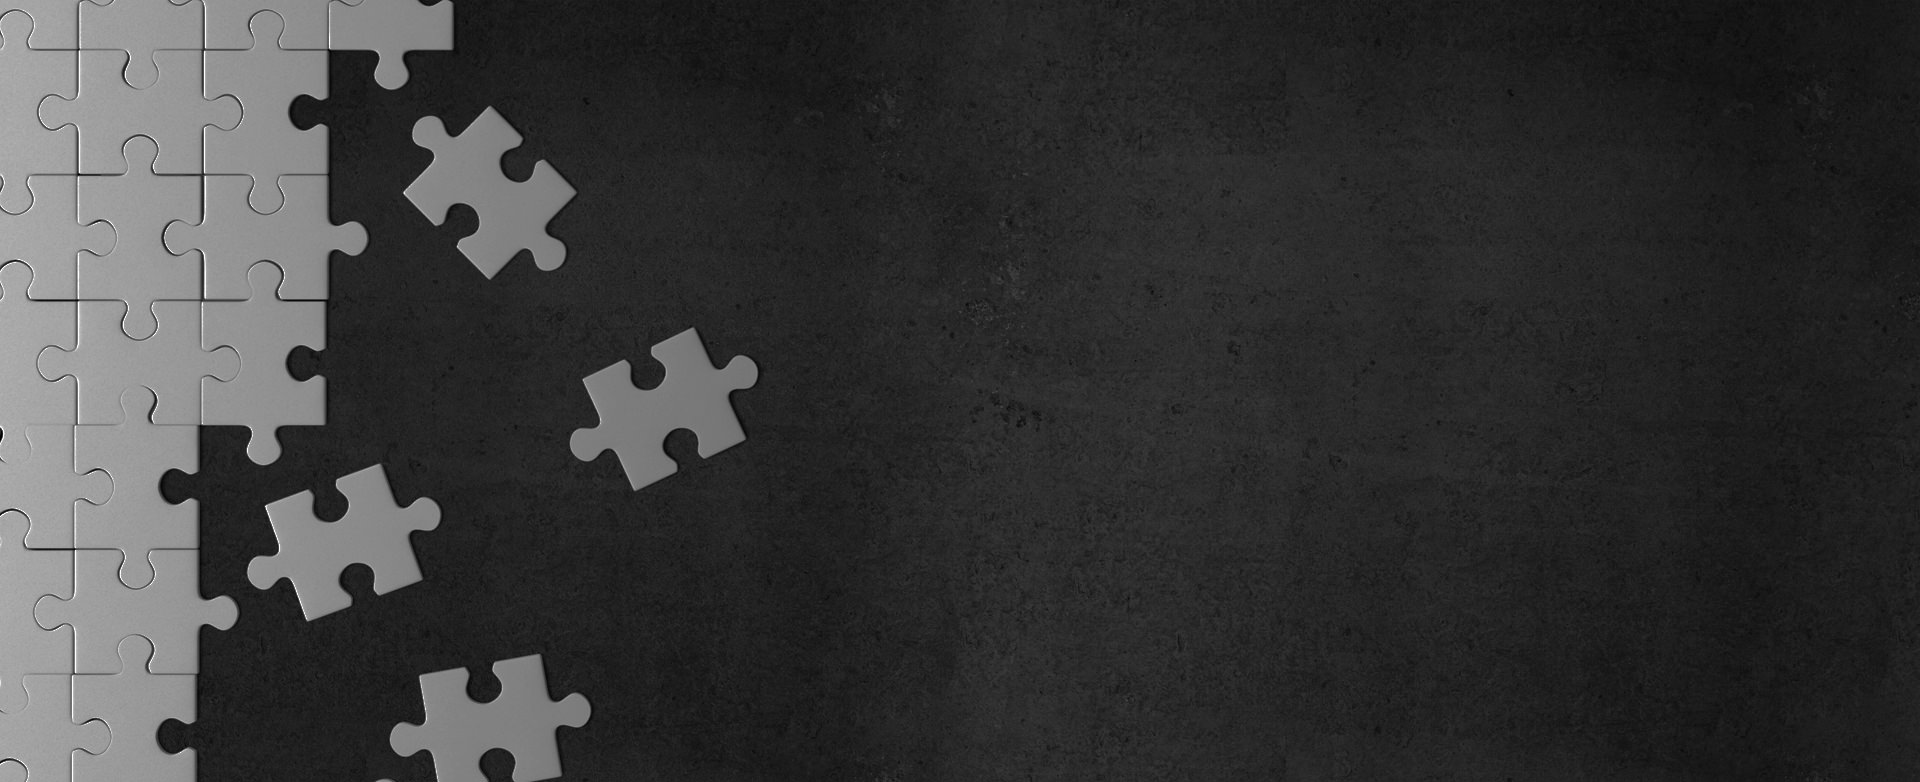 ems-implementation-methodology-puzzle.jpg